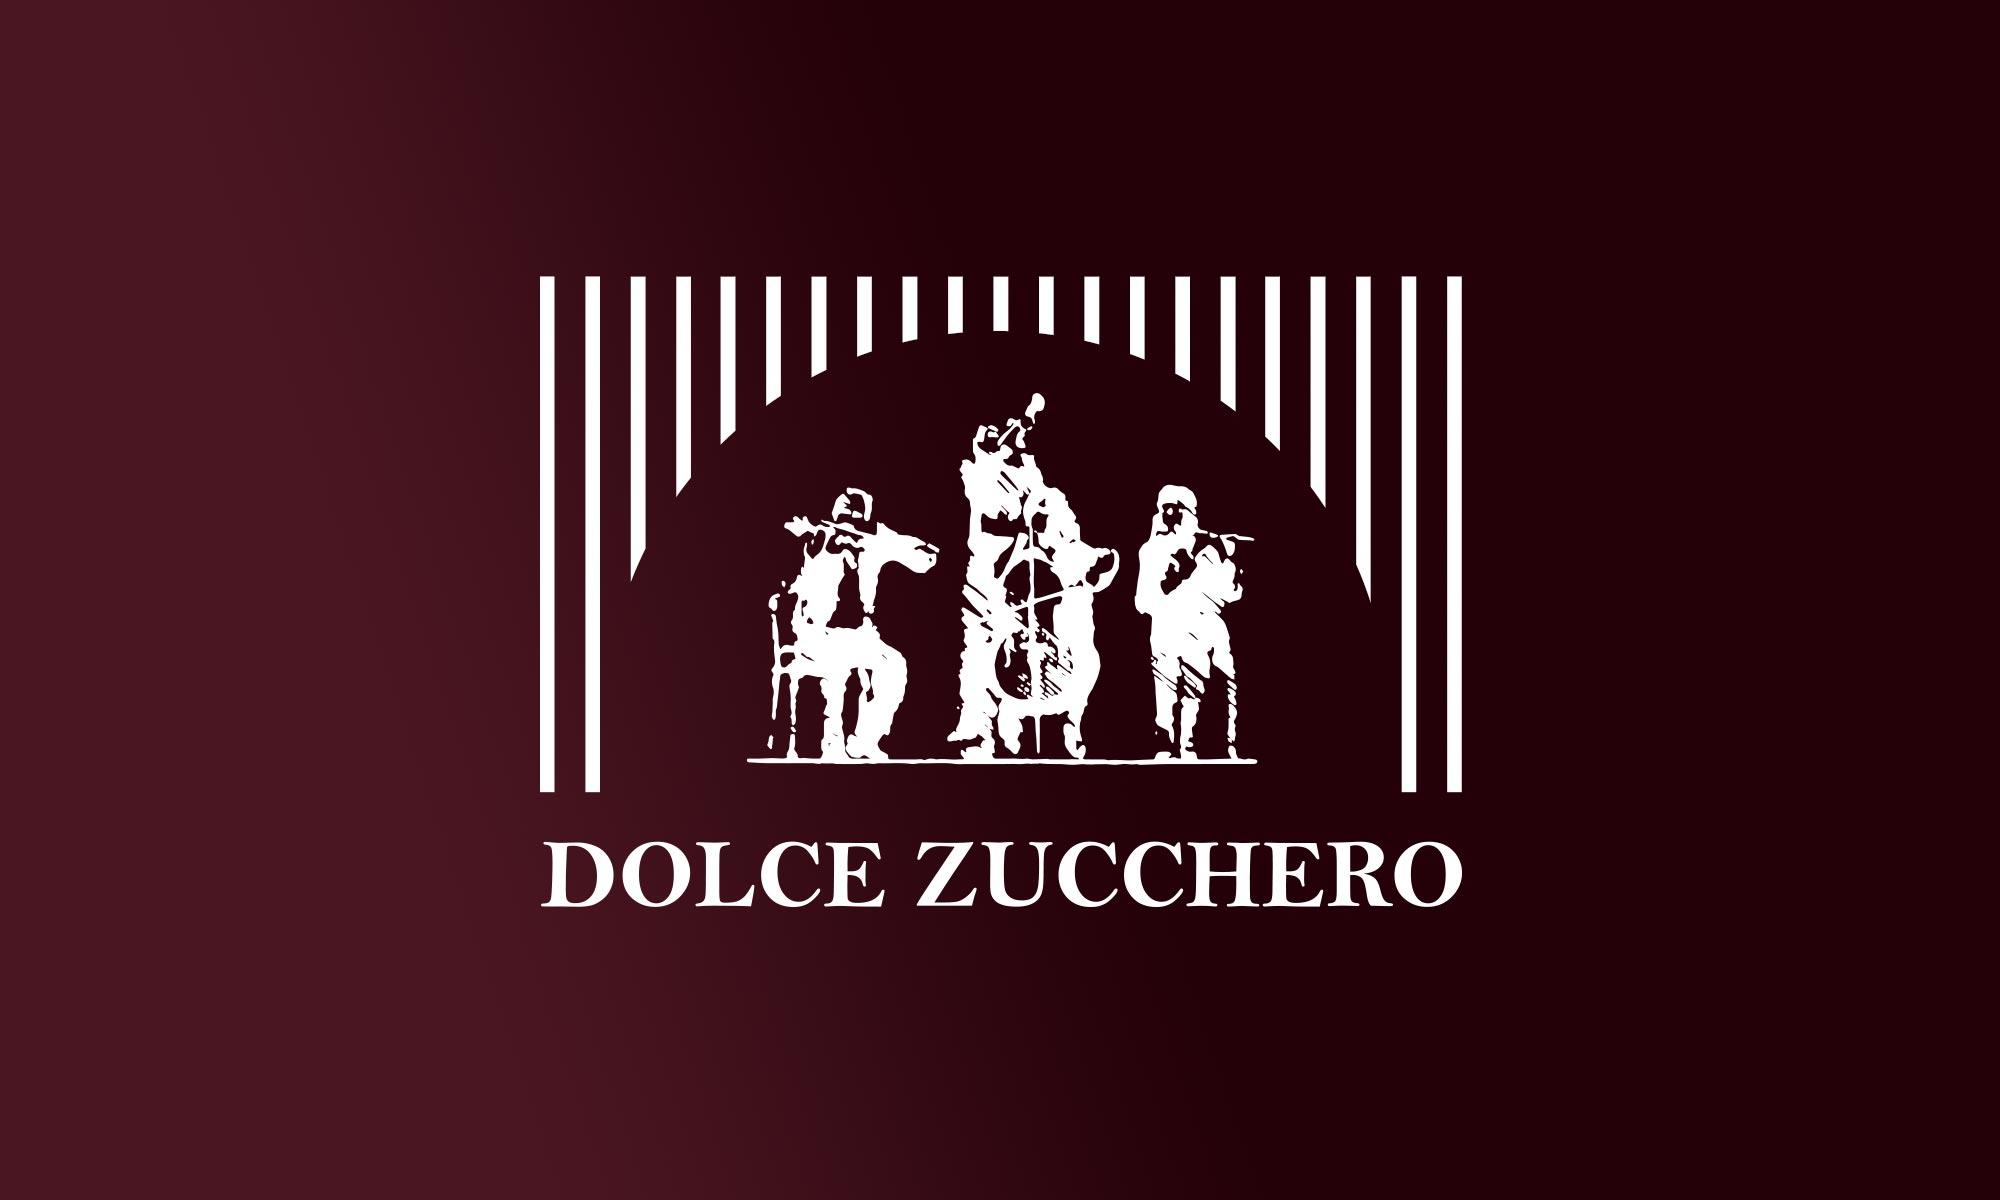 https://www.atelierzoz.com/wp-content/uploads/2020/03/works_dolcezucchero-1.jpg